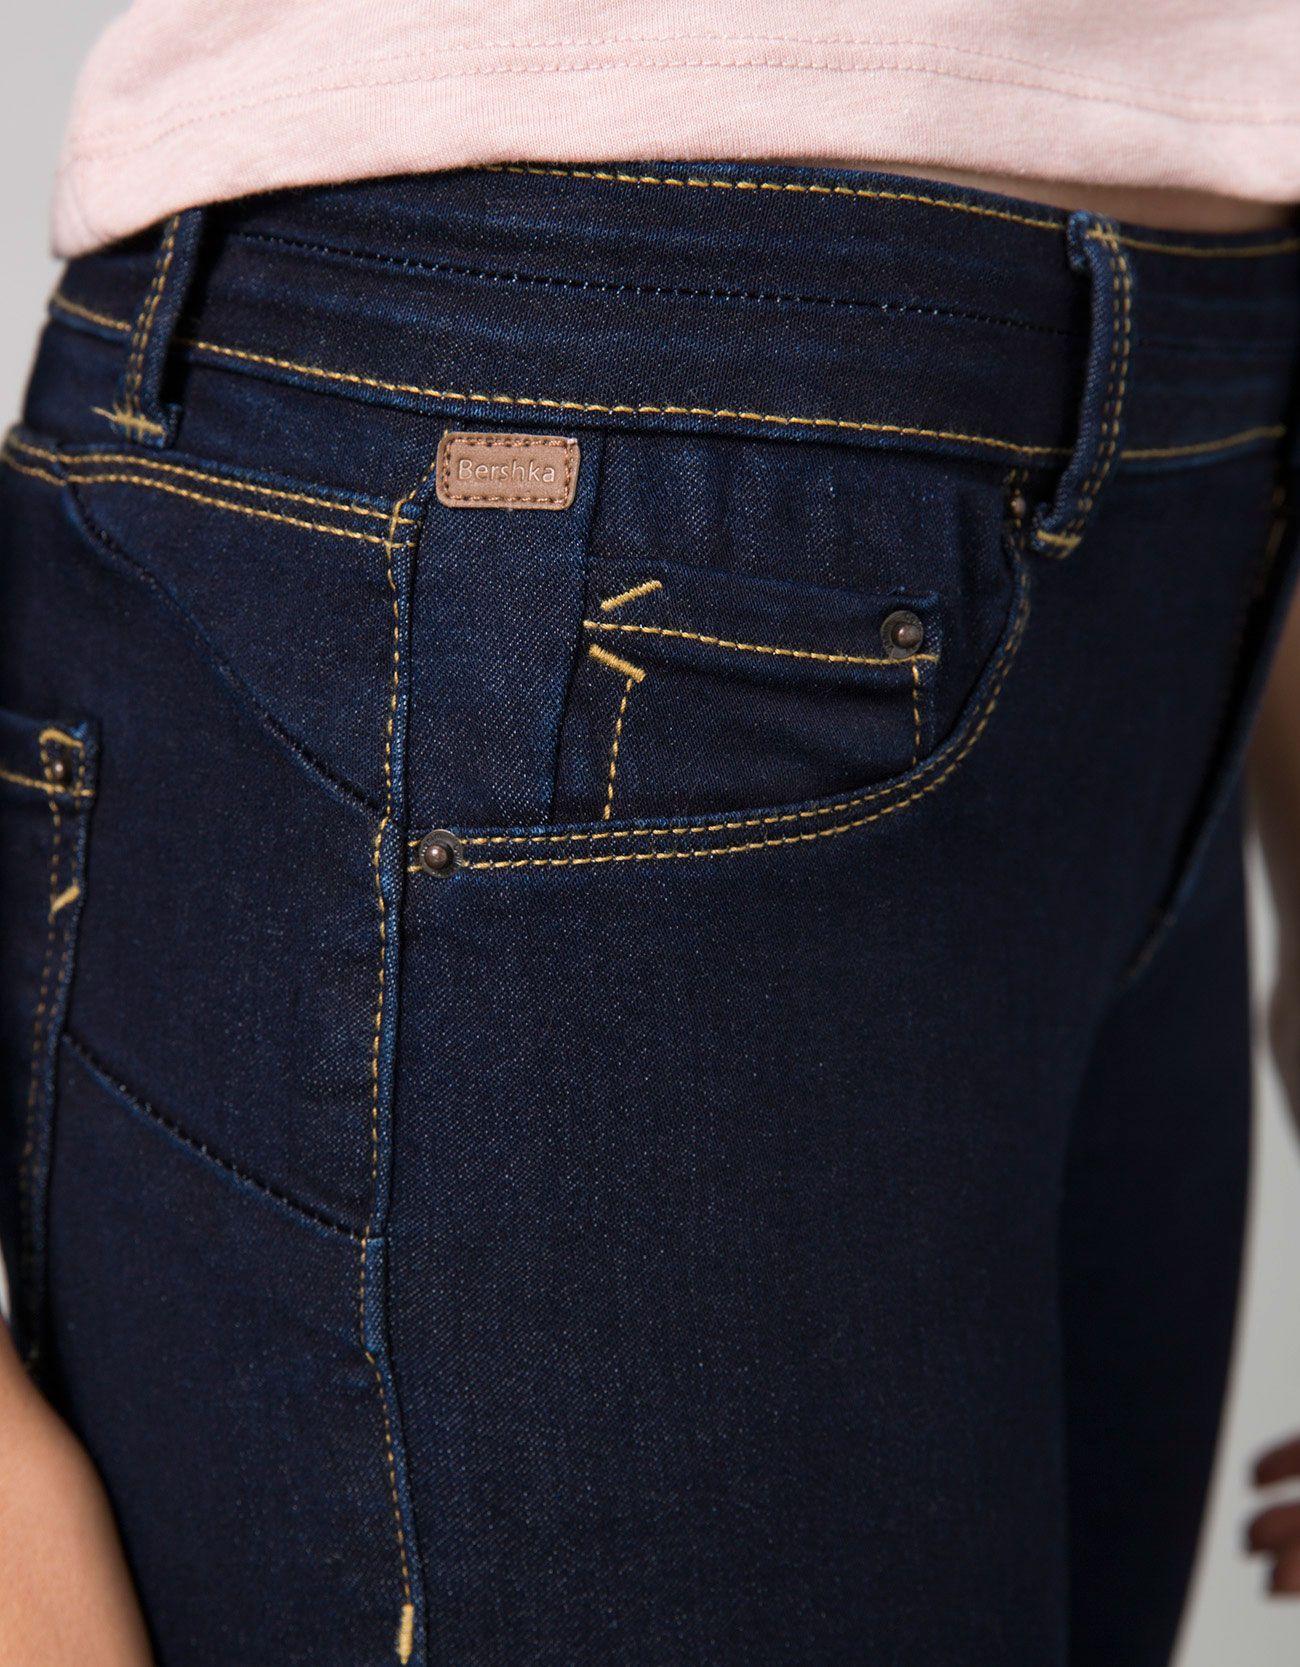 Jeans Bsk Push Up Bsk Recommends Bershka Espana Jeans De Moda Pantalones De Moda Mujer Pantalones De Moda